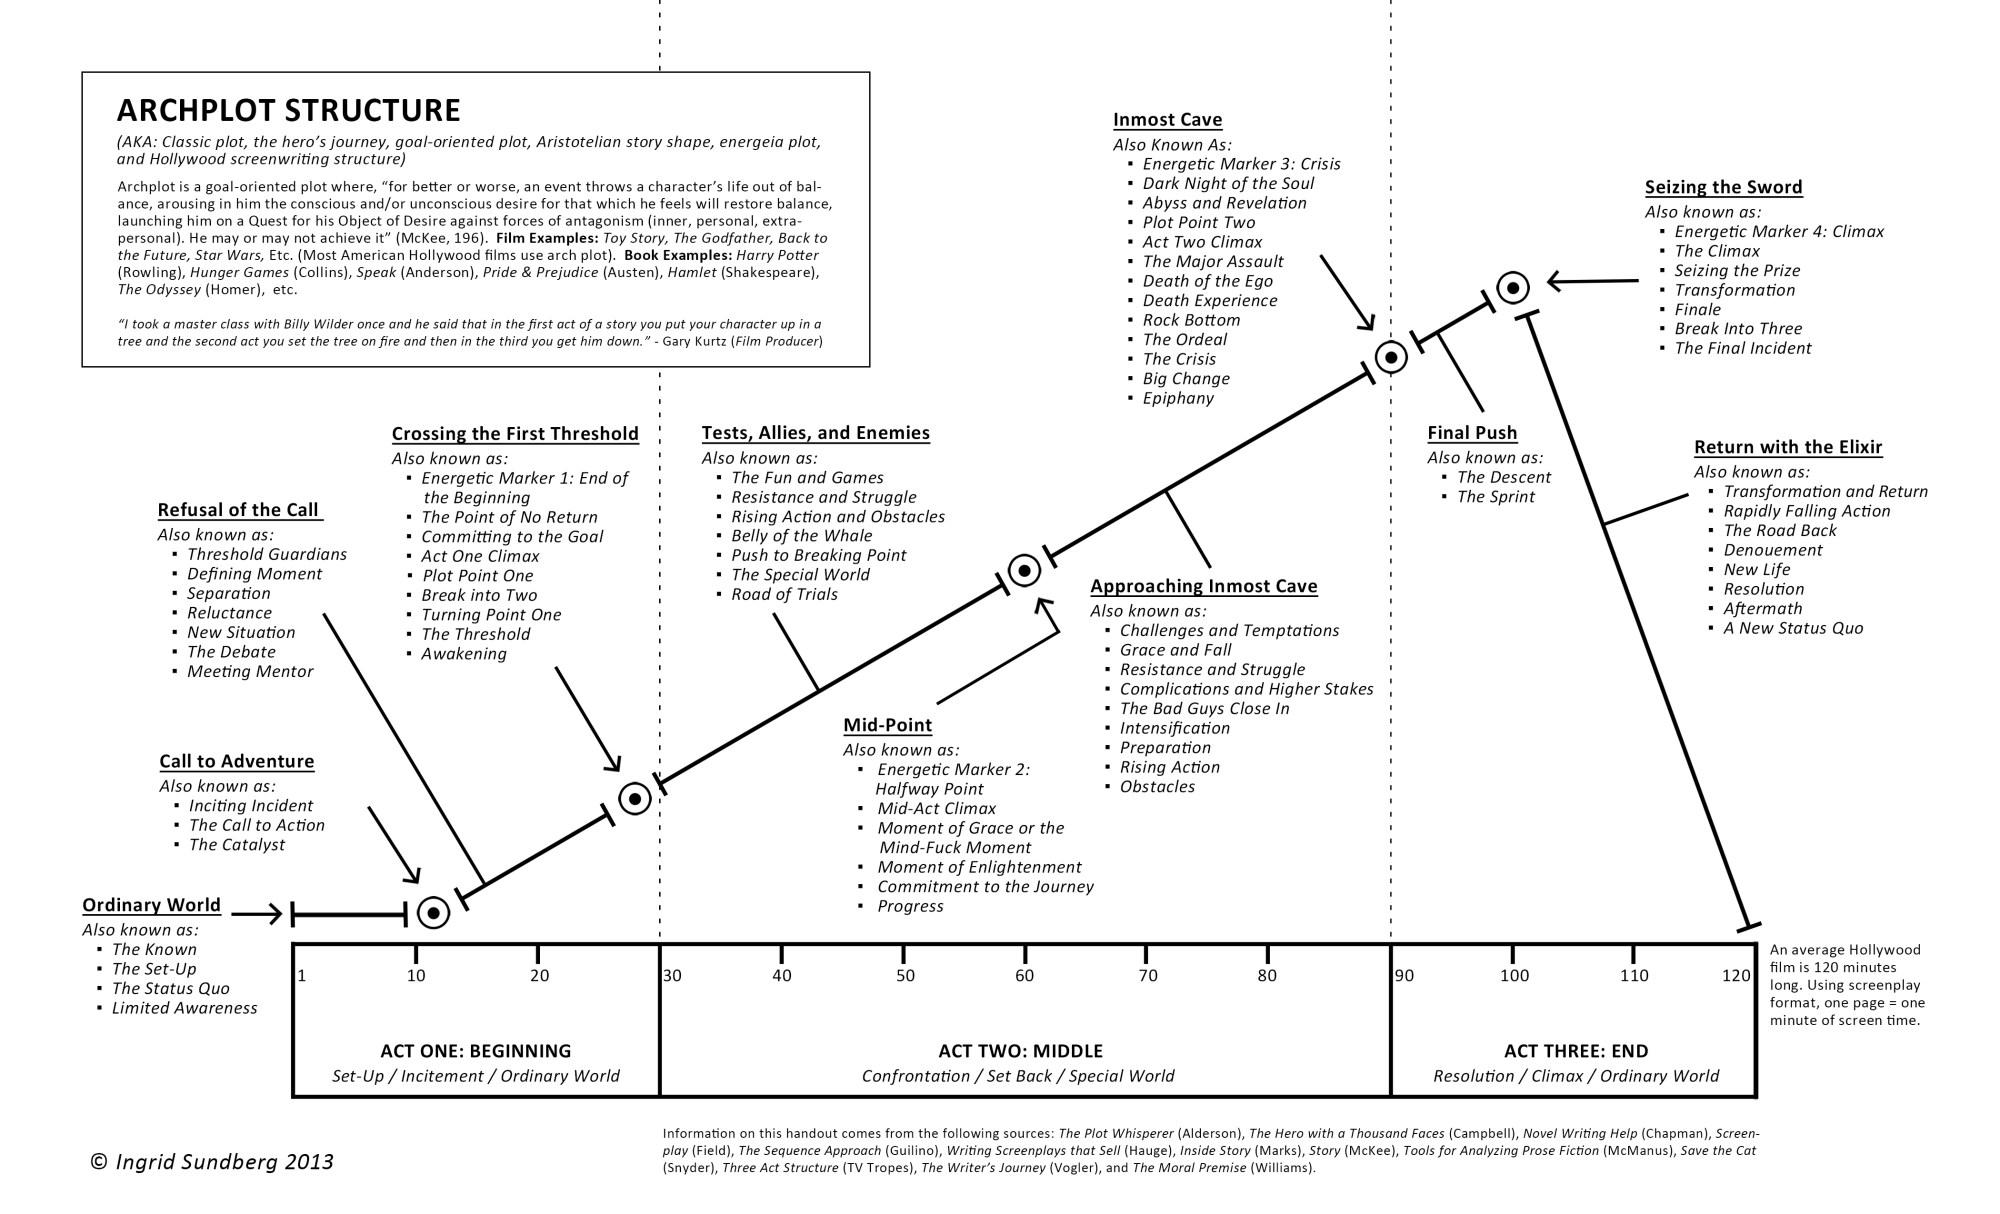 hight resolution of arch plot structure by ingrid sundberg